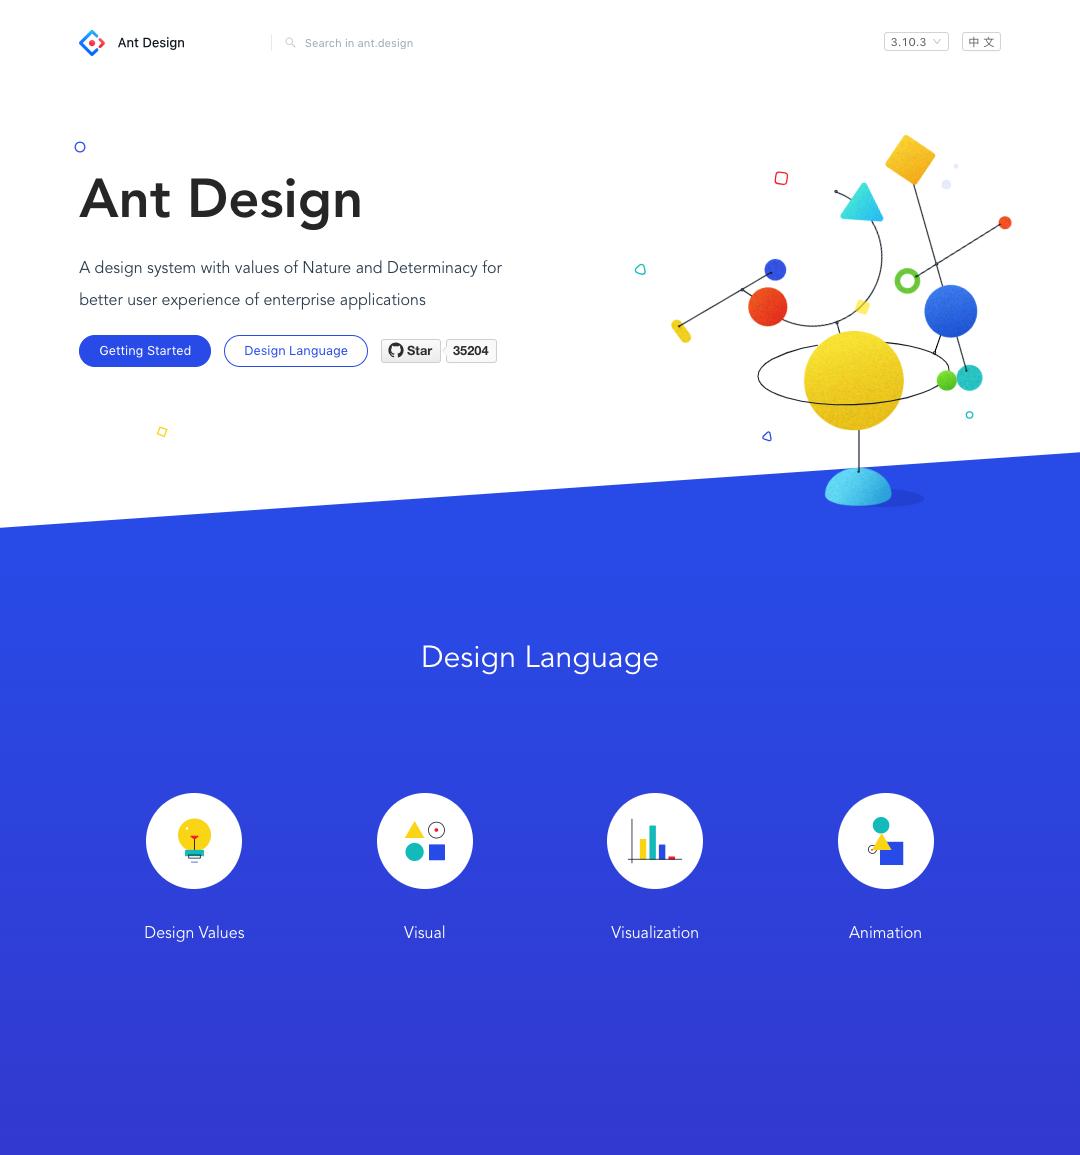 The Ant Design design system